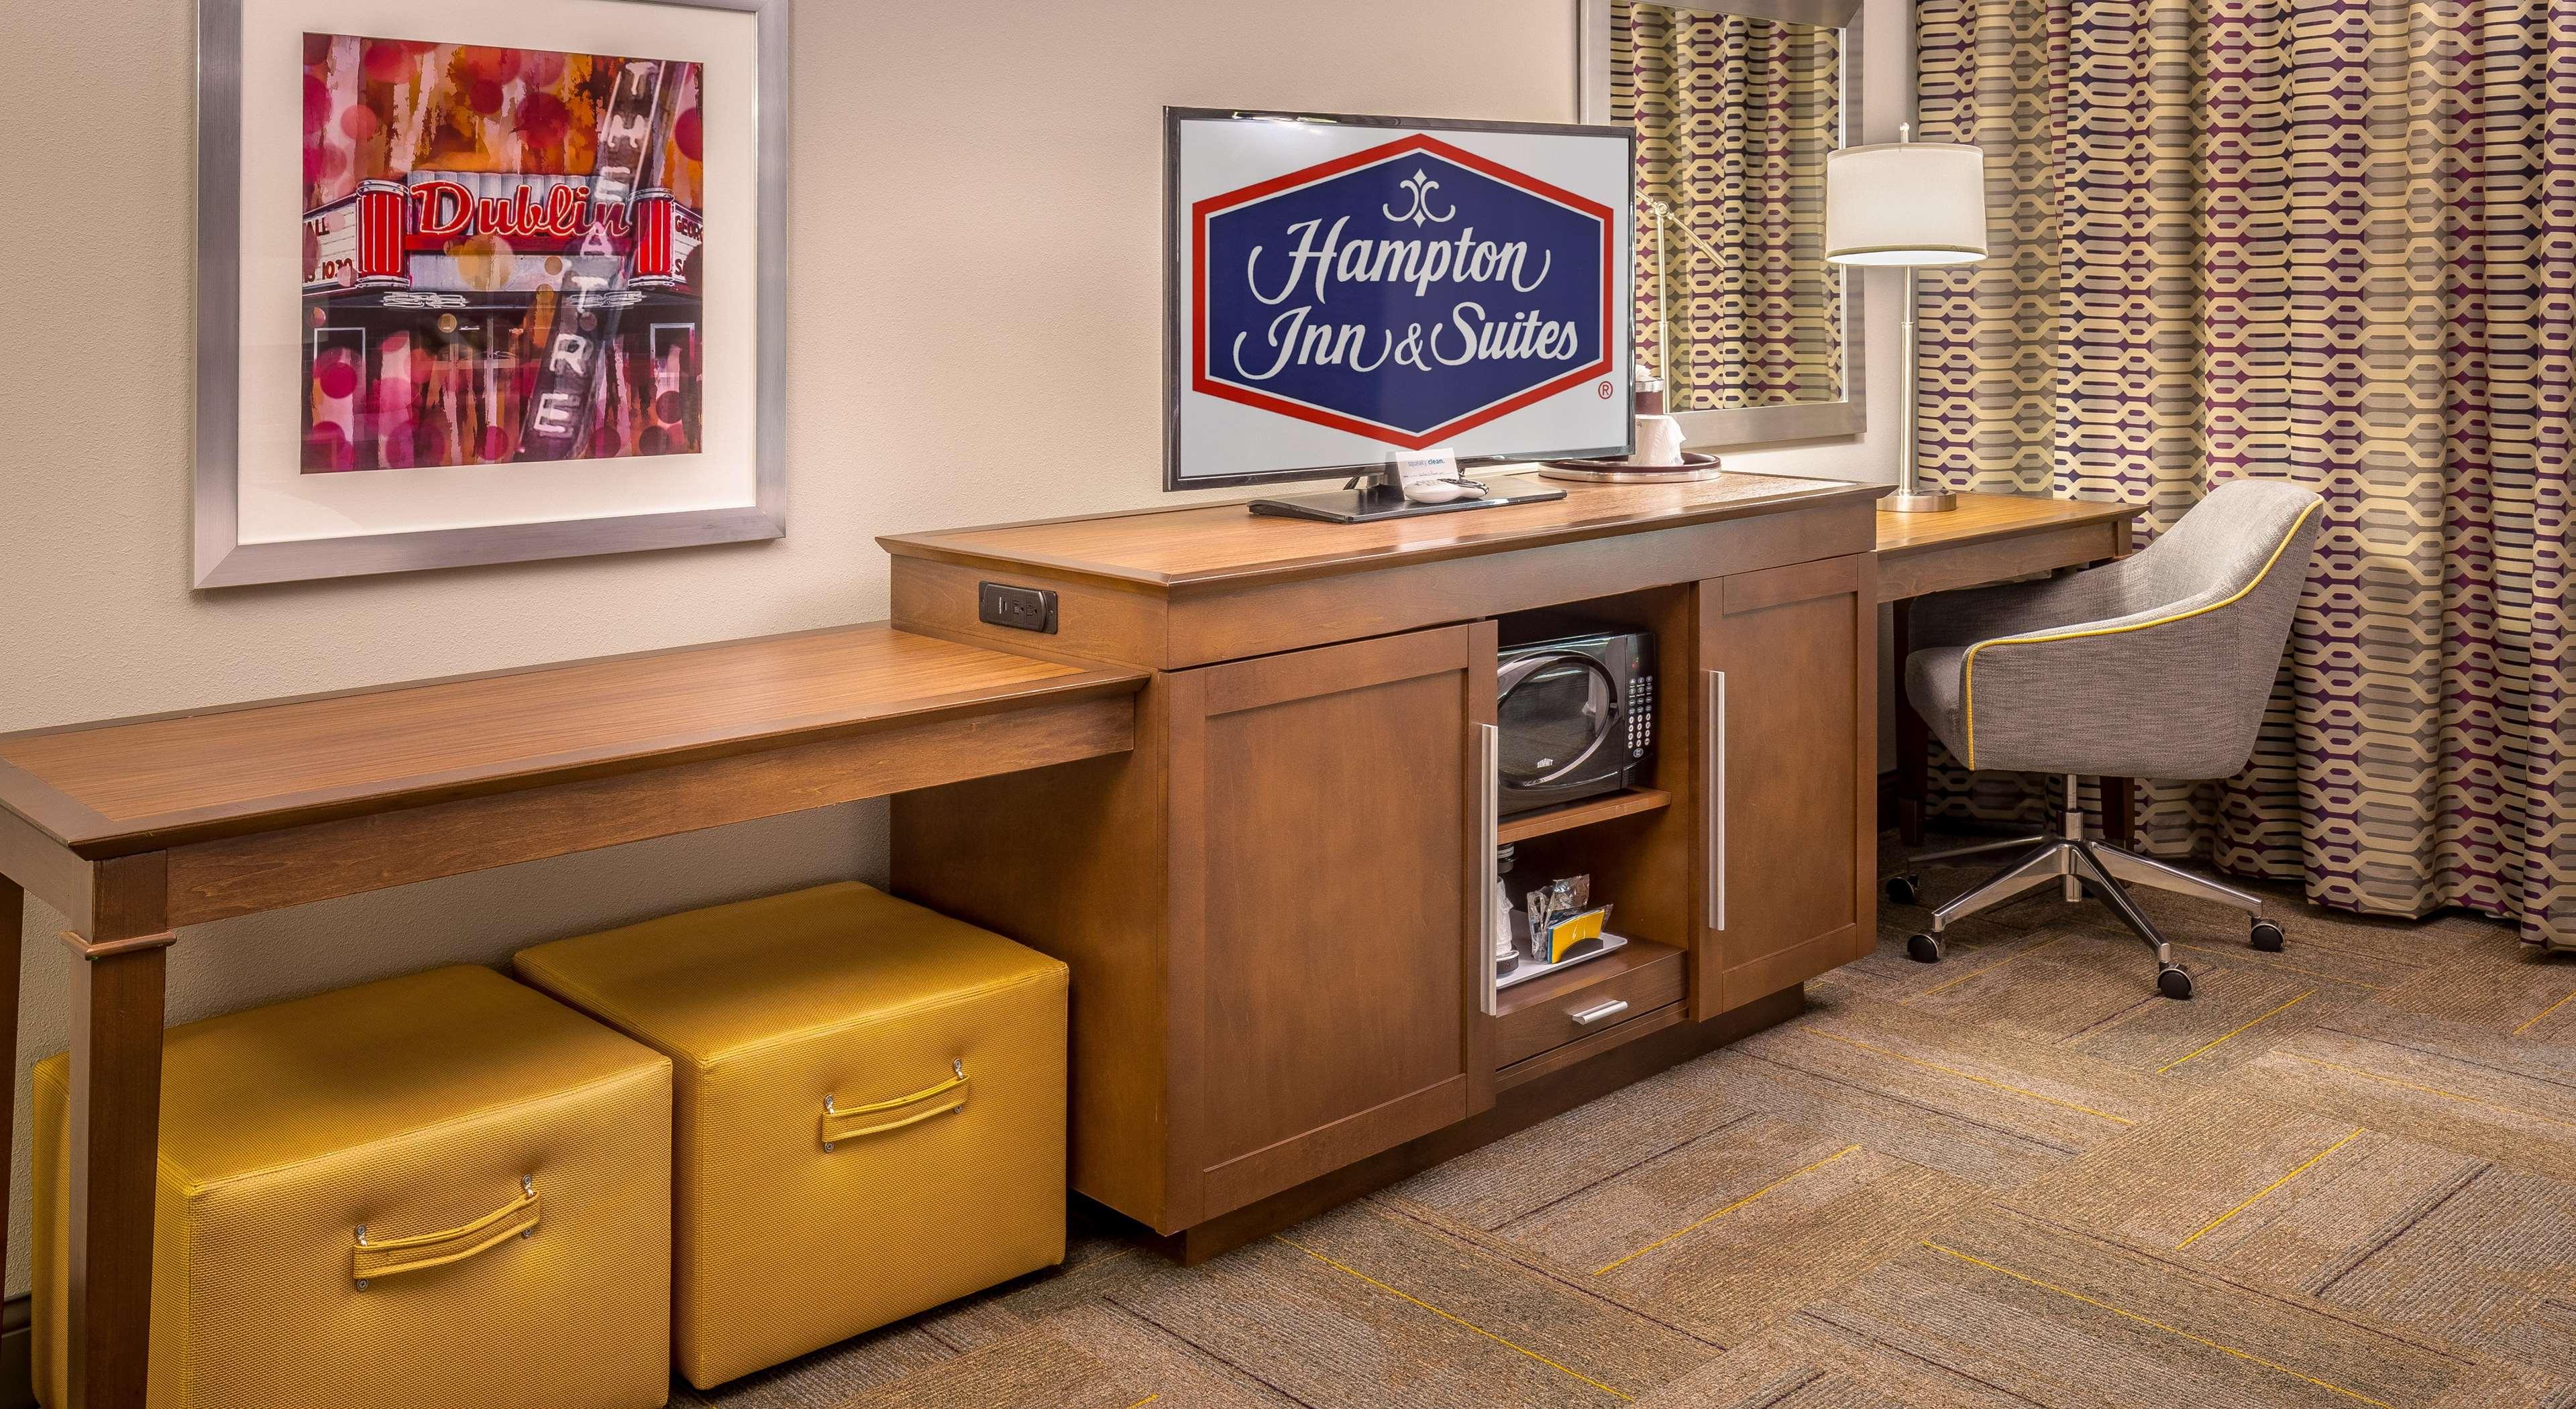 Hampton Inn & Suites Dublin image 48